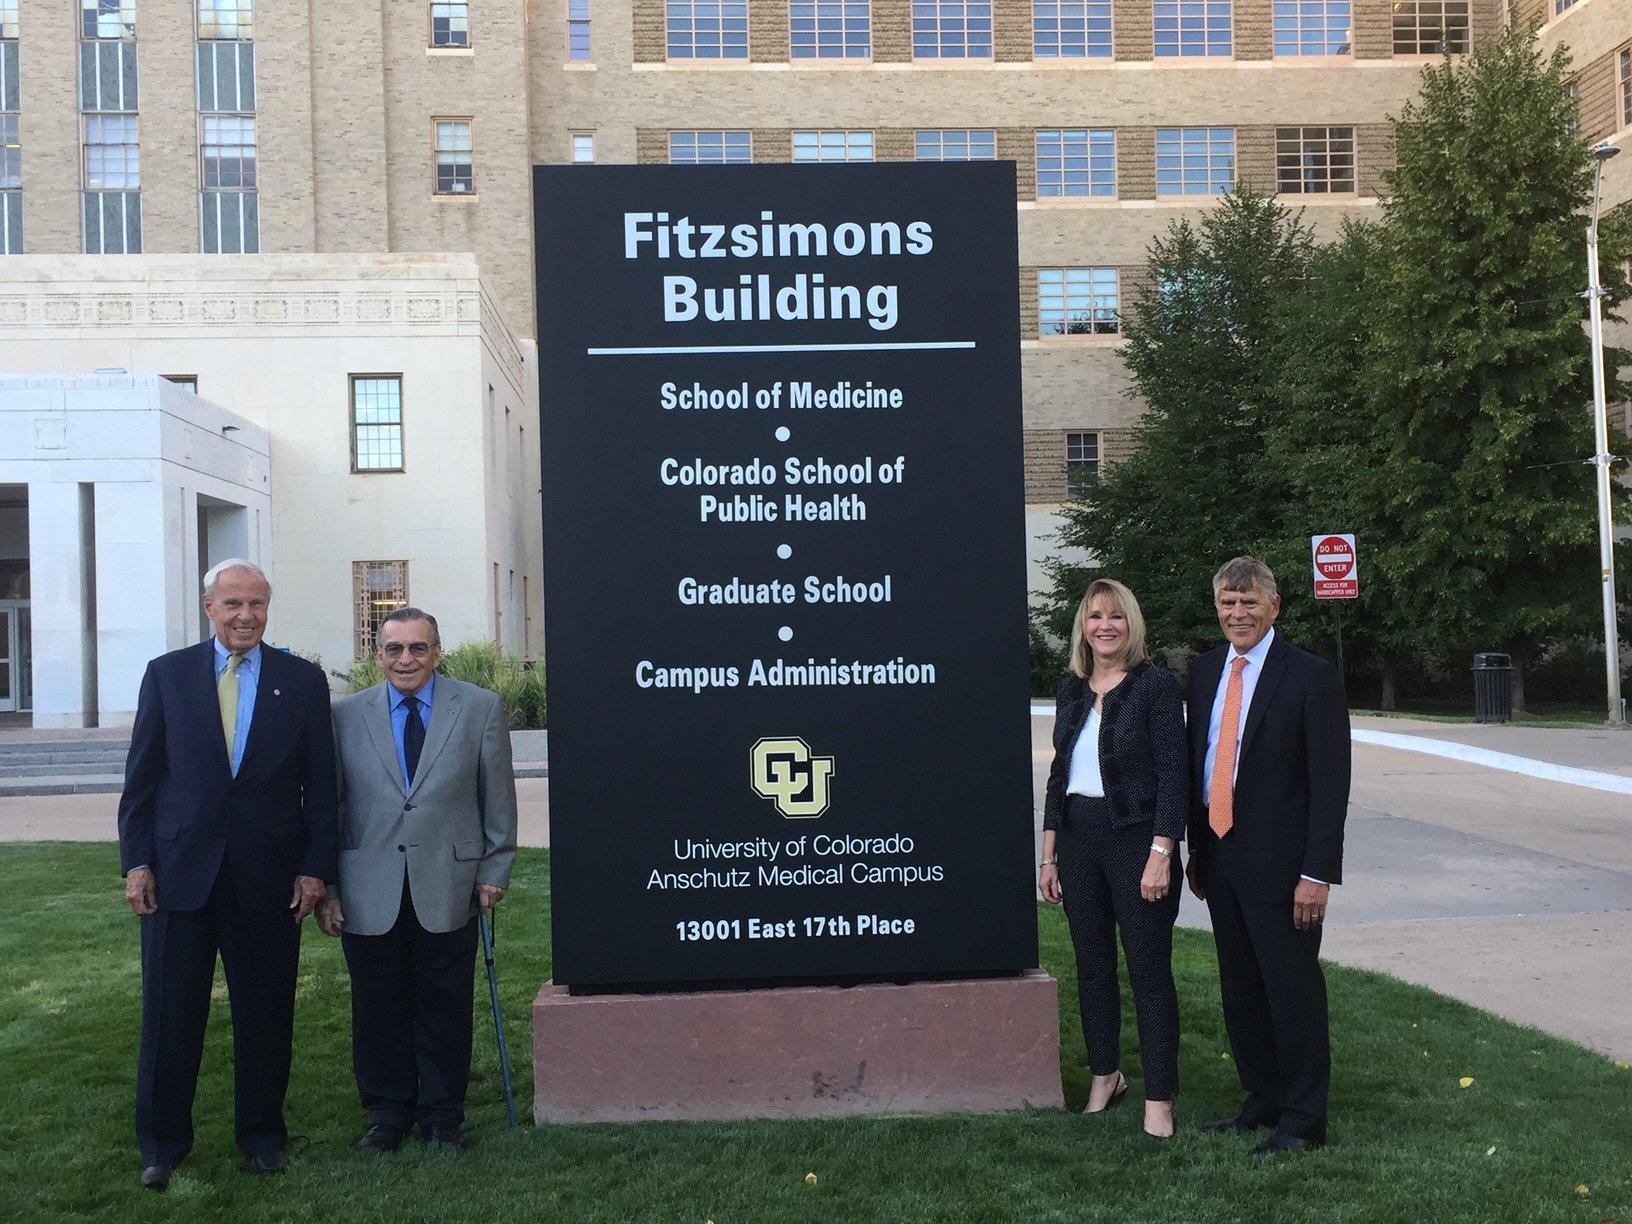 Fitzsimons Building